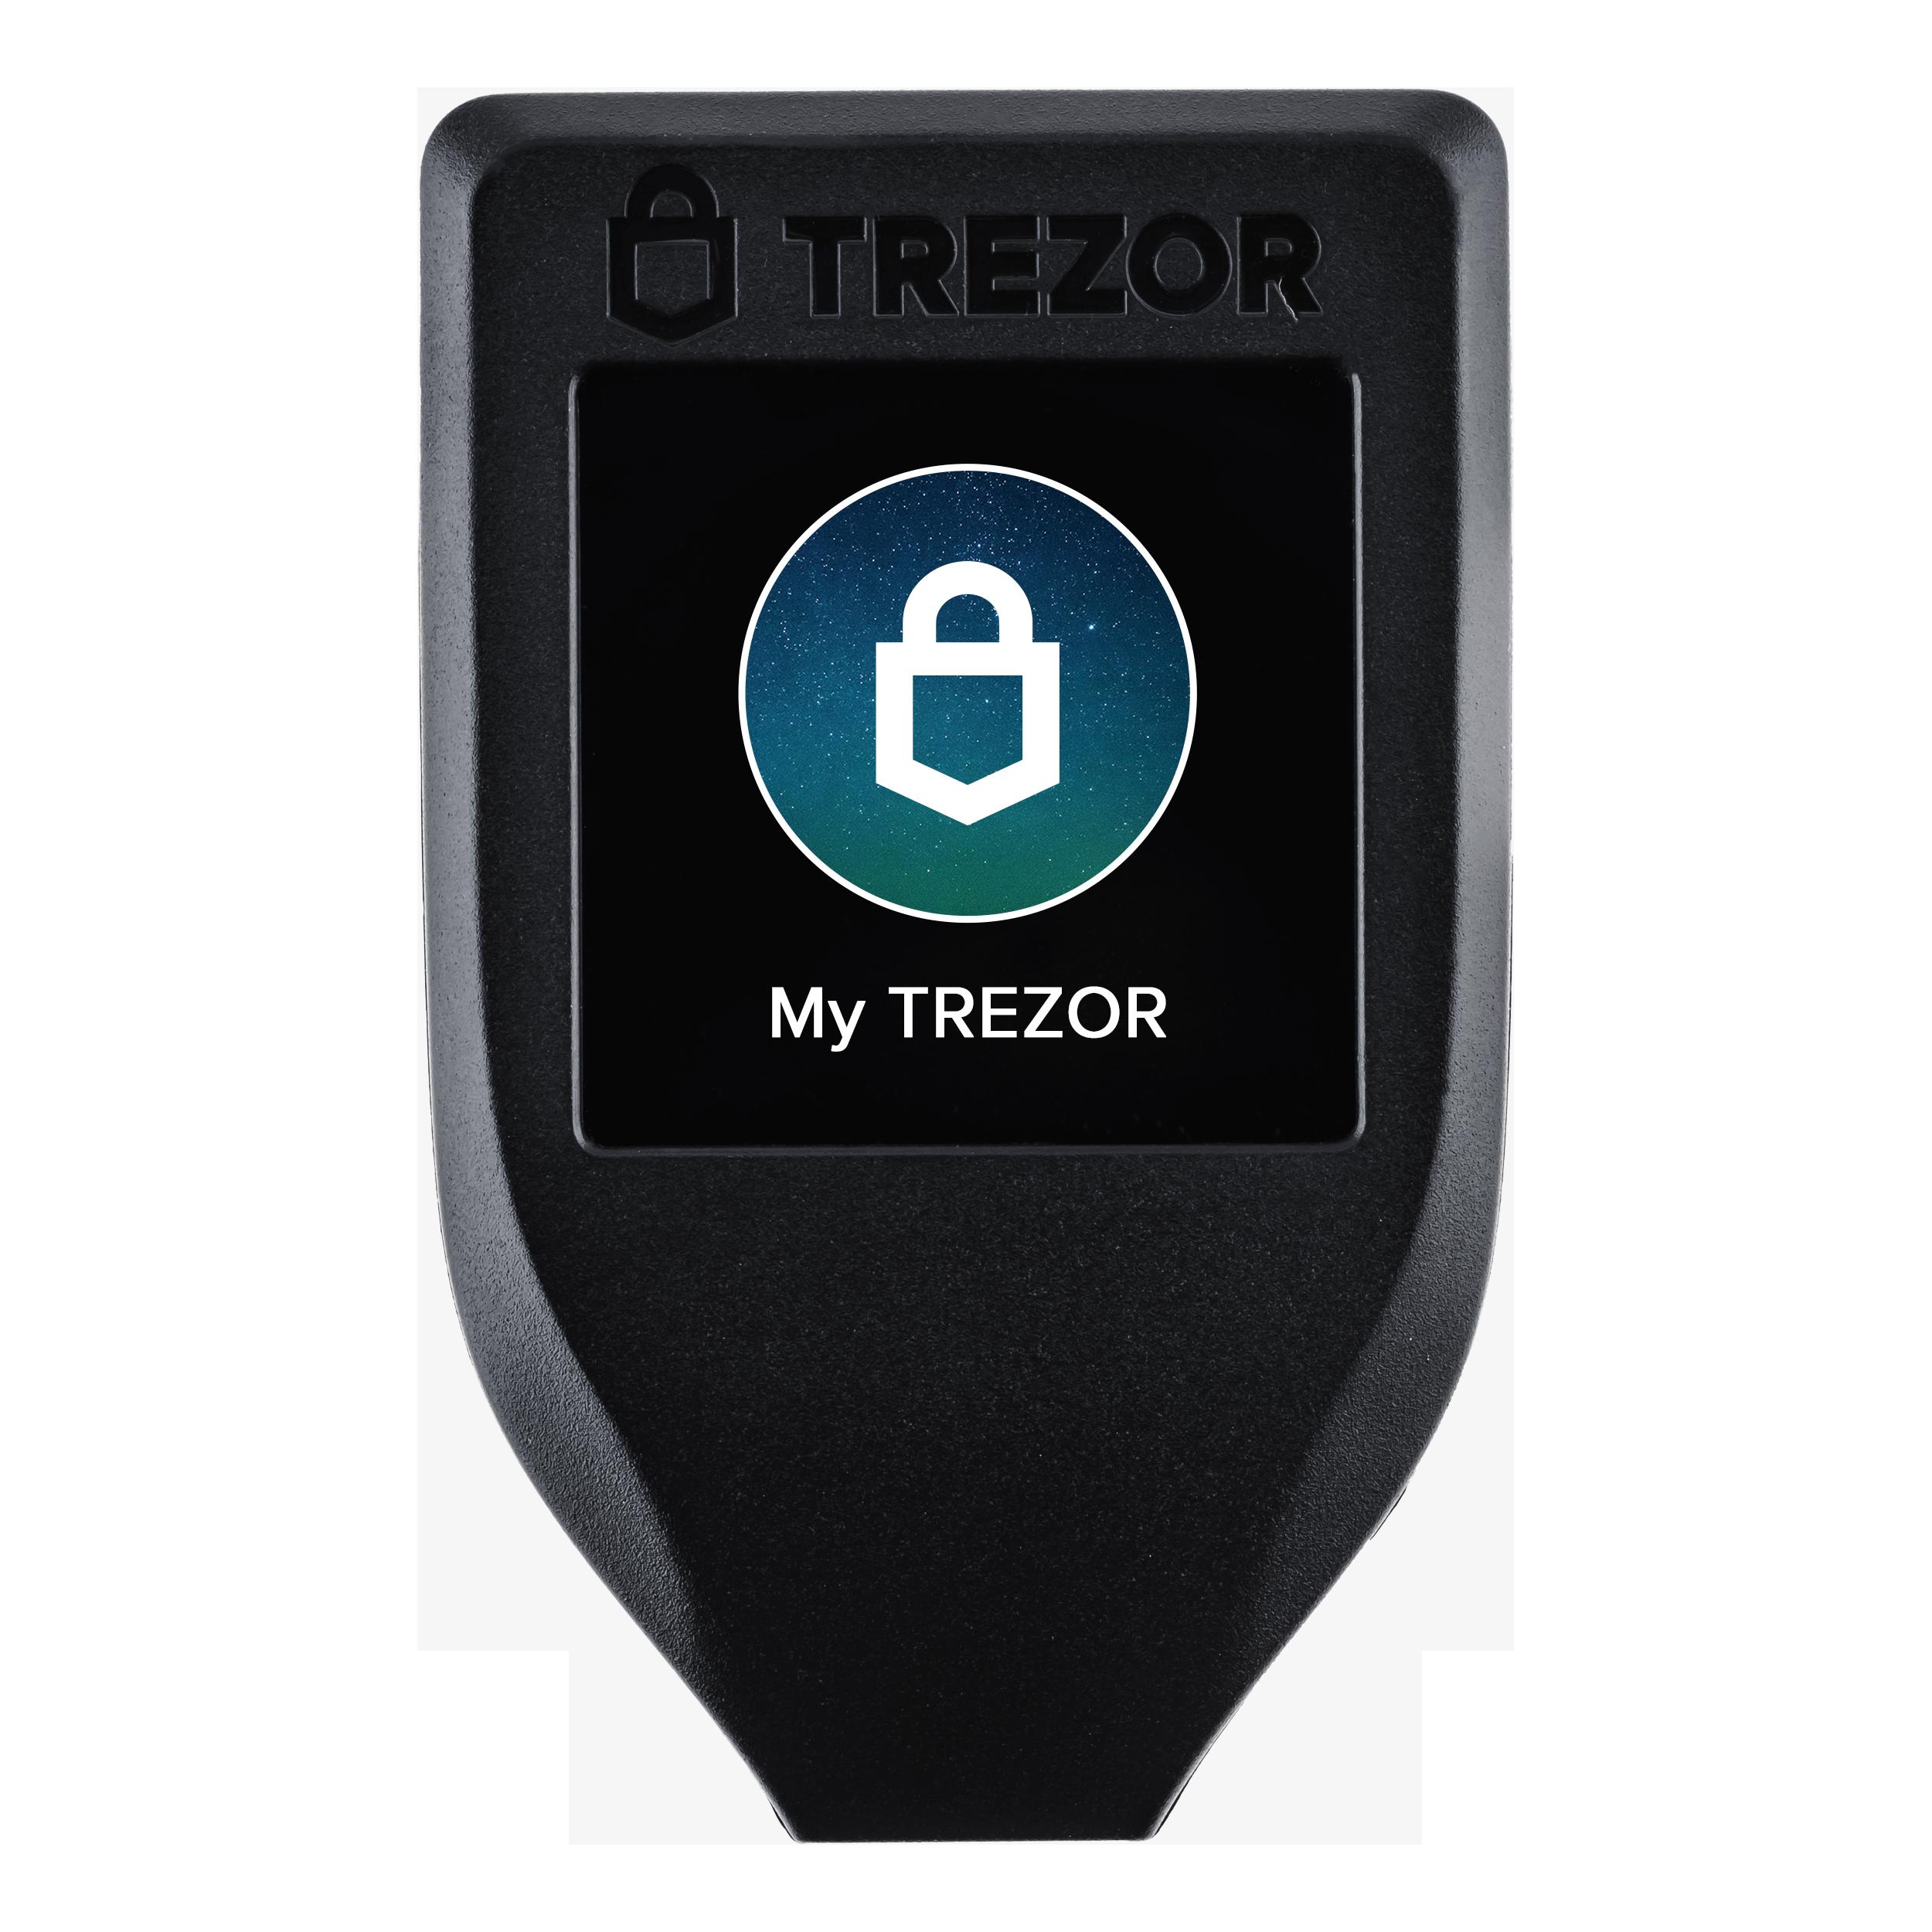 trezor_model_t_002.png